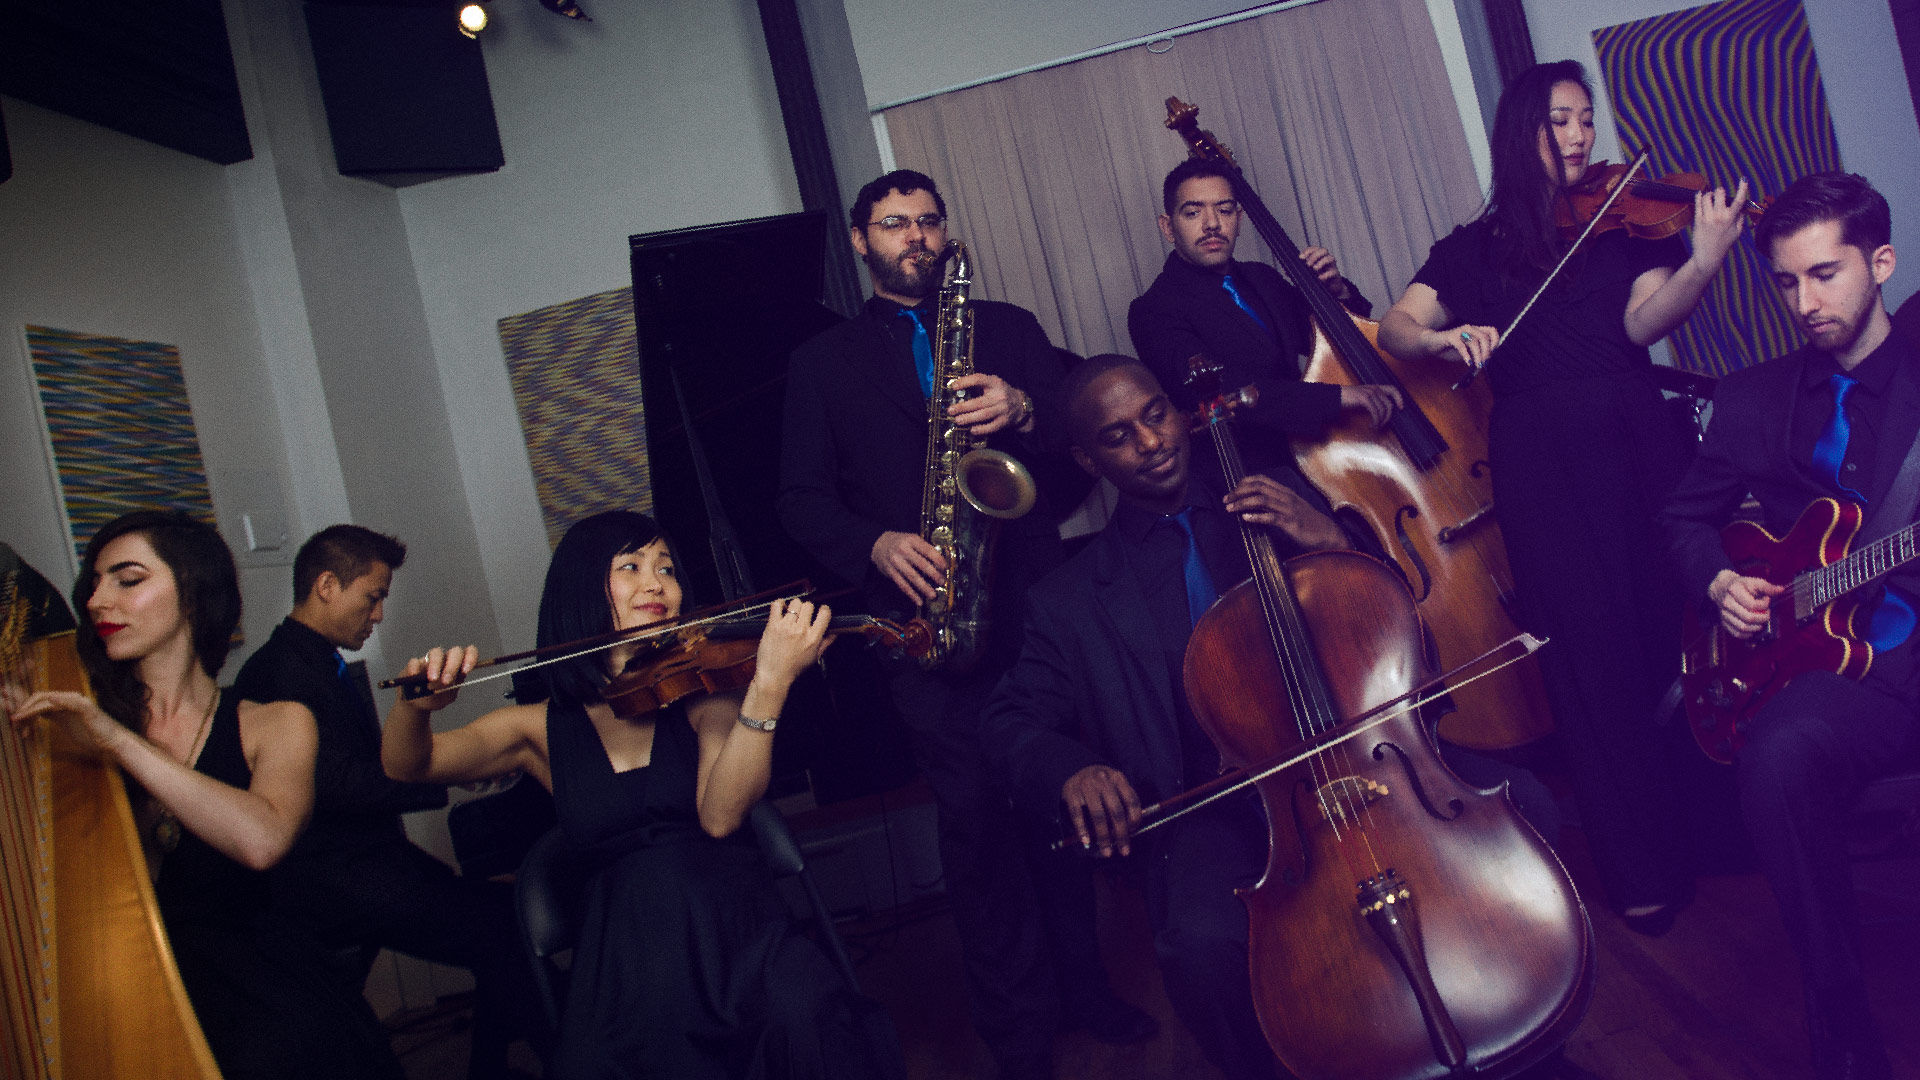 Chamber ensemble (Rockstar Images)